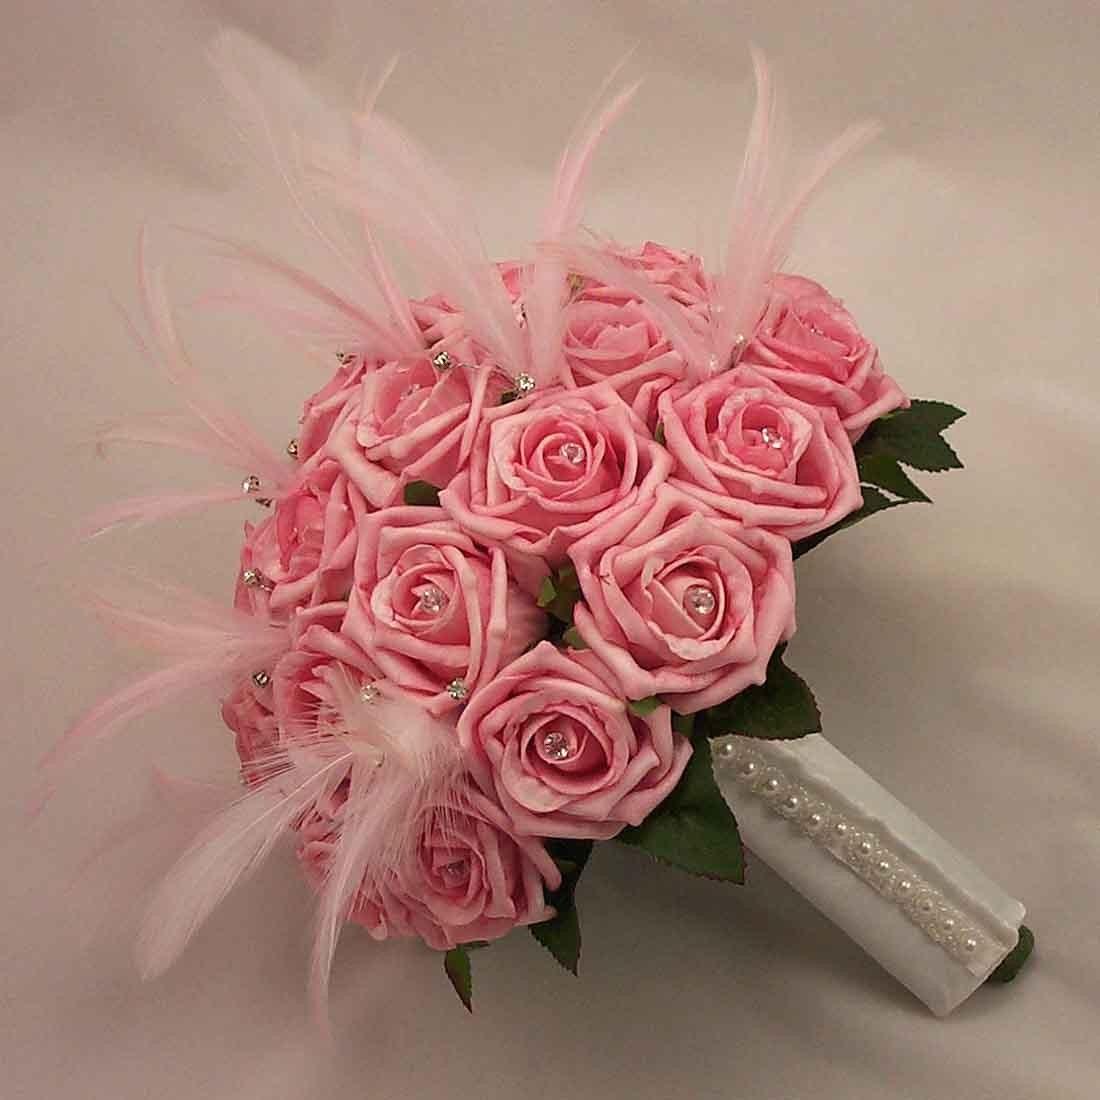 Bridal Bouquets - Pink Rose Feather Bridal Bouquet - Silk Wedding ...